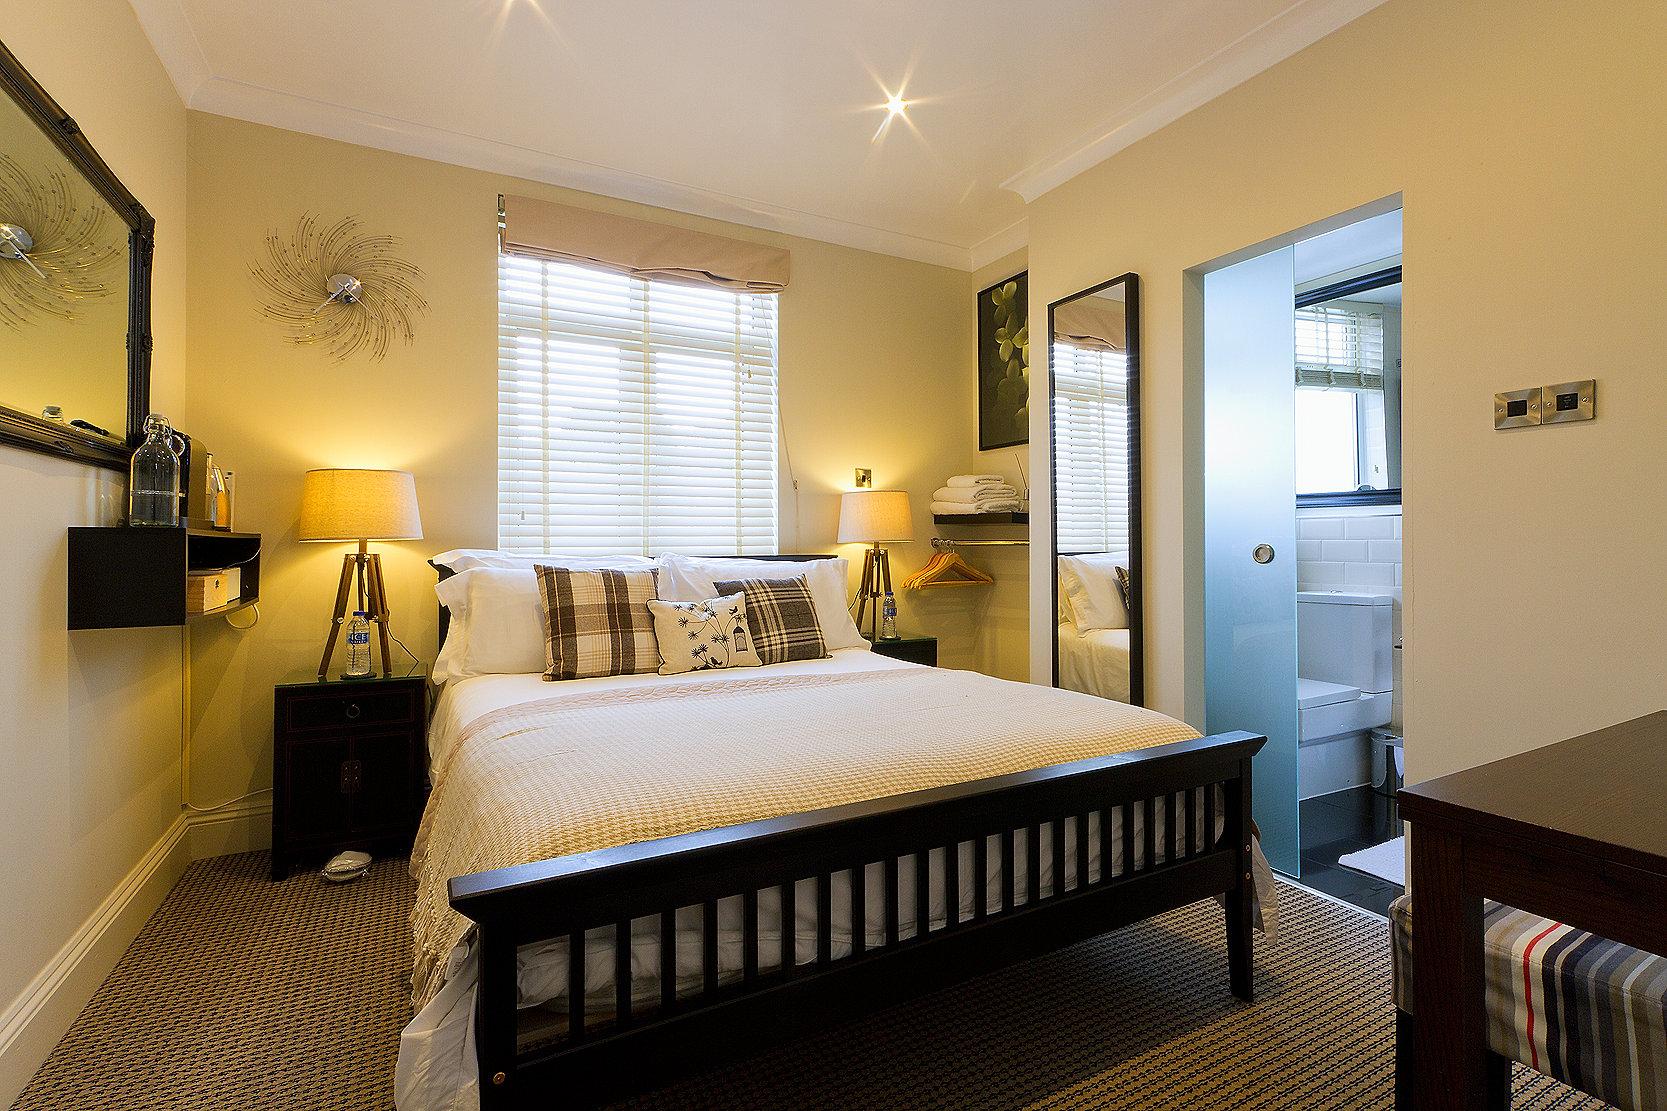 Tavistock Bedroom Furniture